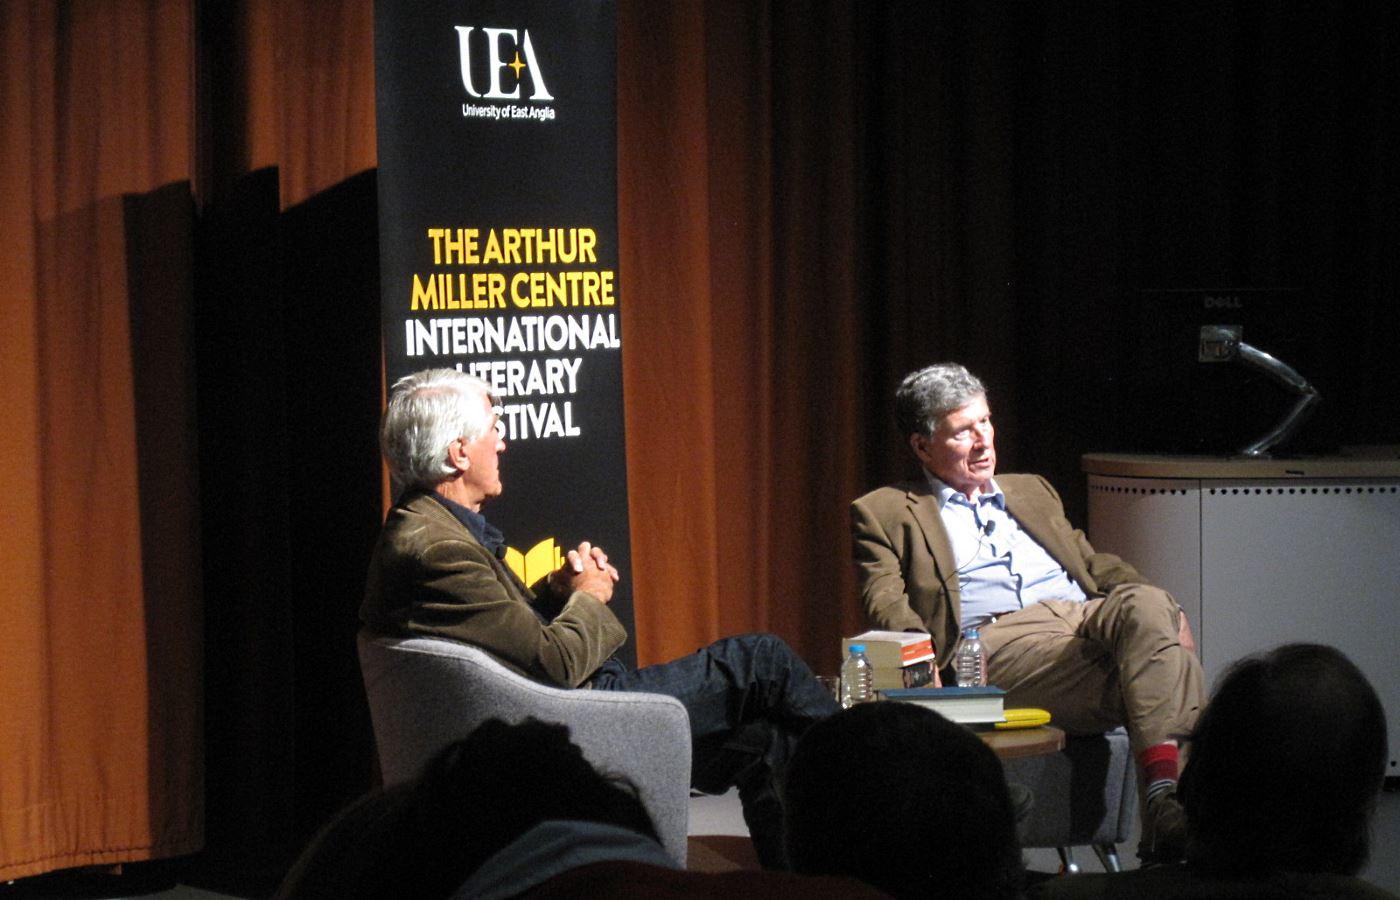 Christopher Andrew at UEA Literary Festiva